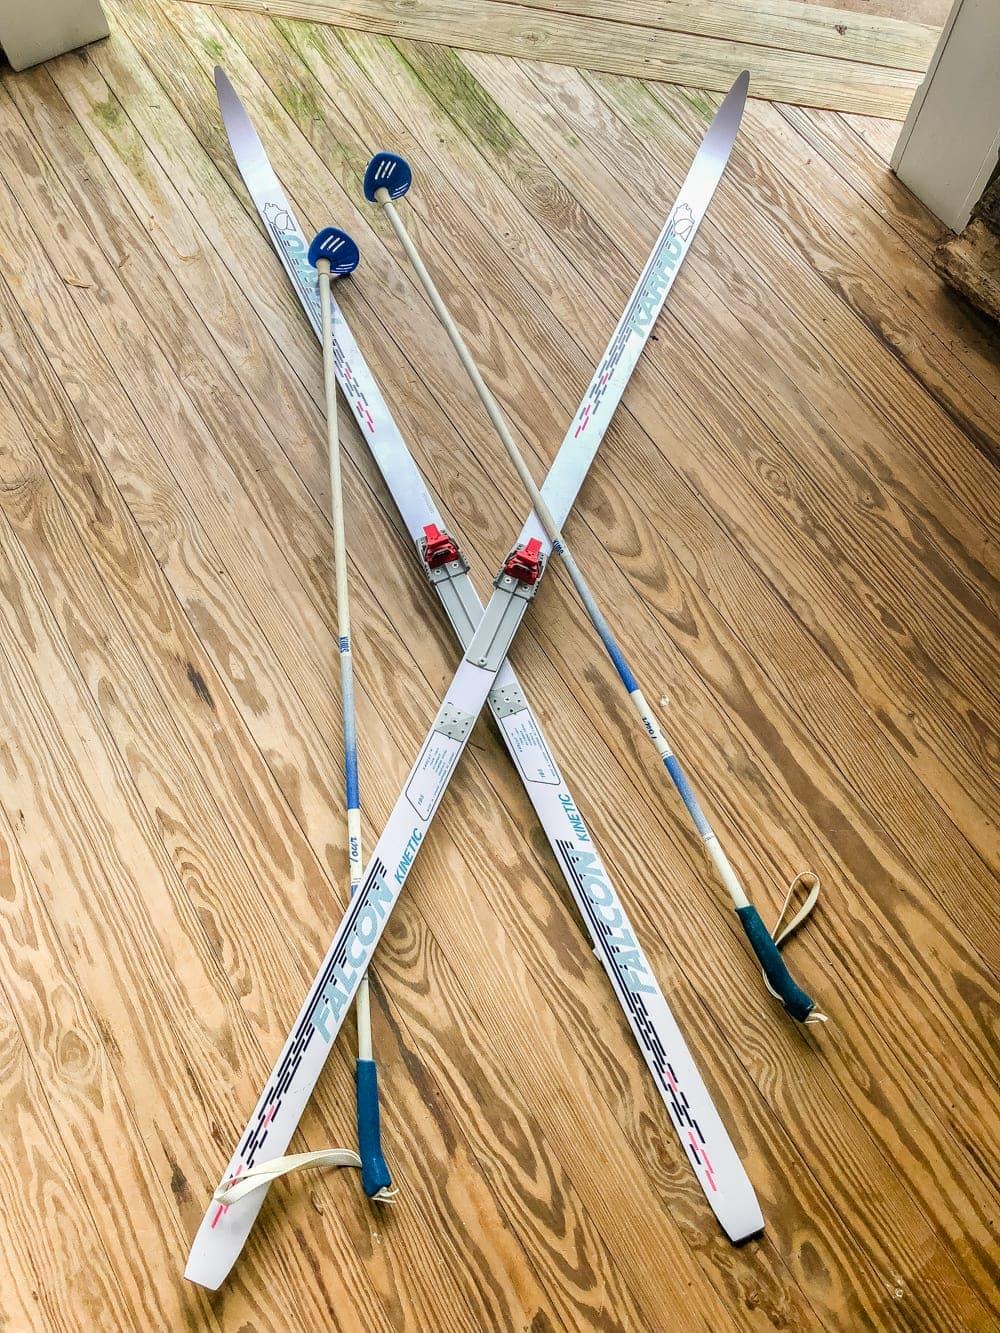 Faux Antique Winter Skis Wall Decor   How to turn basic fiberglass snow skis into winter wall decor using chalk paint and wax for an antique wood finish. #winterdecor #walldecor #christmasdecor #diychristmas #diydecor #thrifting #thriftyhome #thriftydecor #budgetdecor